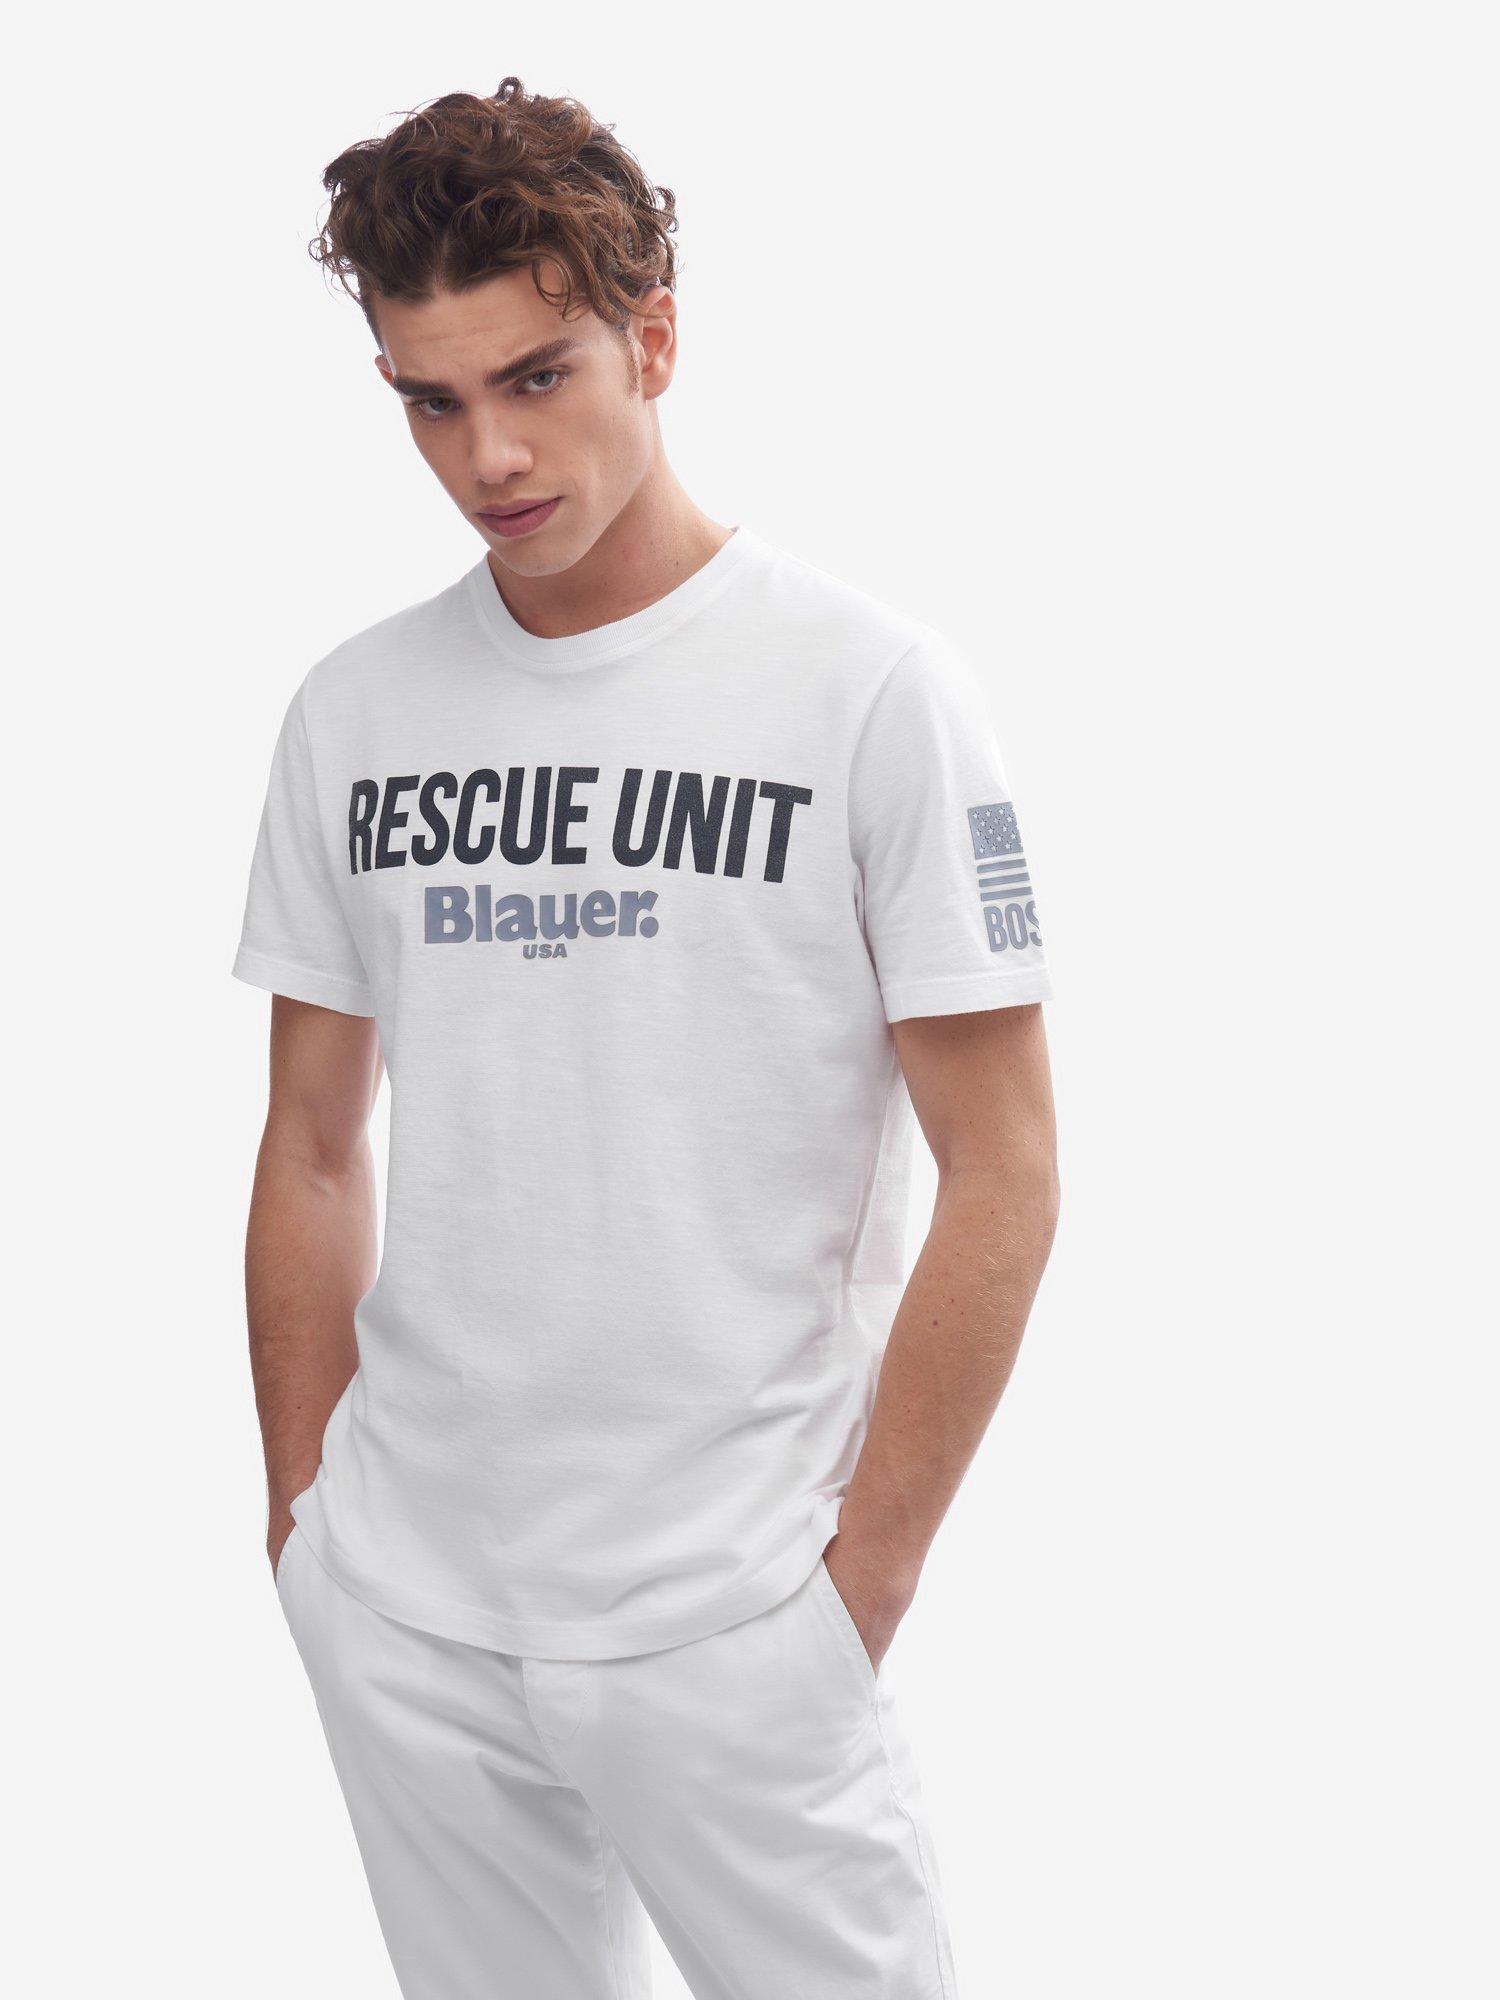 Blauer - T-SHIRT RESCUE UNIT - Blanc - Blauer